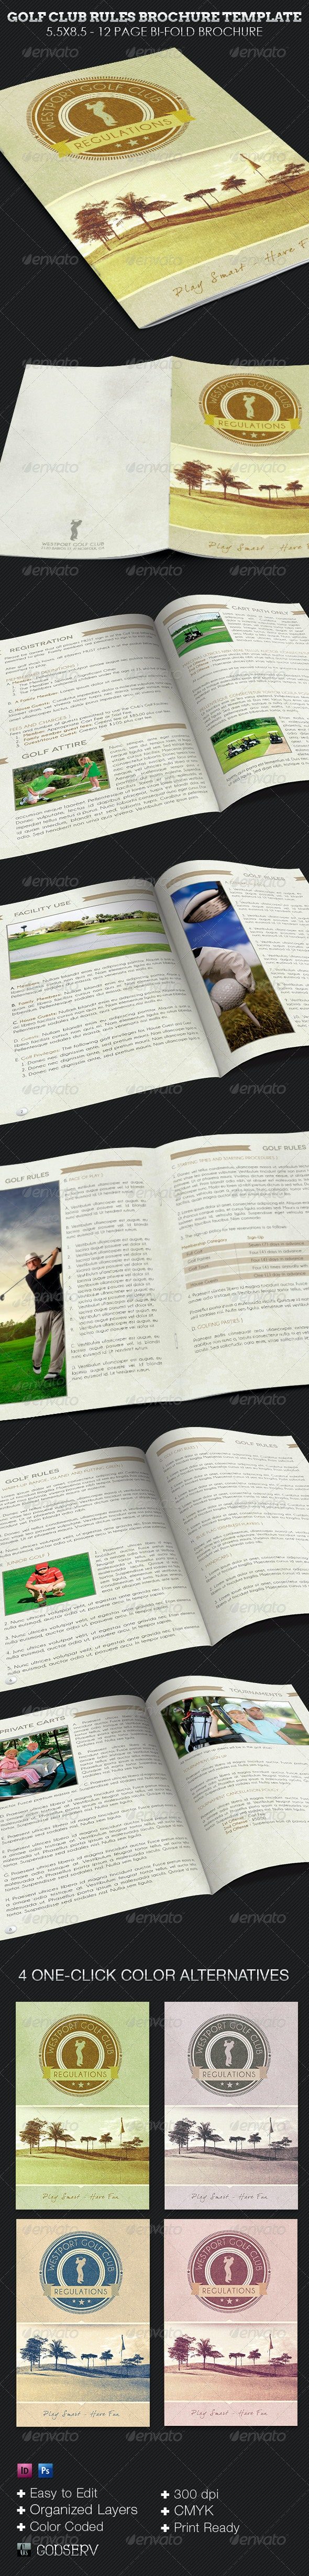 Golf Club Rules Brochure Template - Print Templates